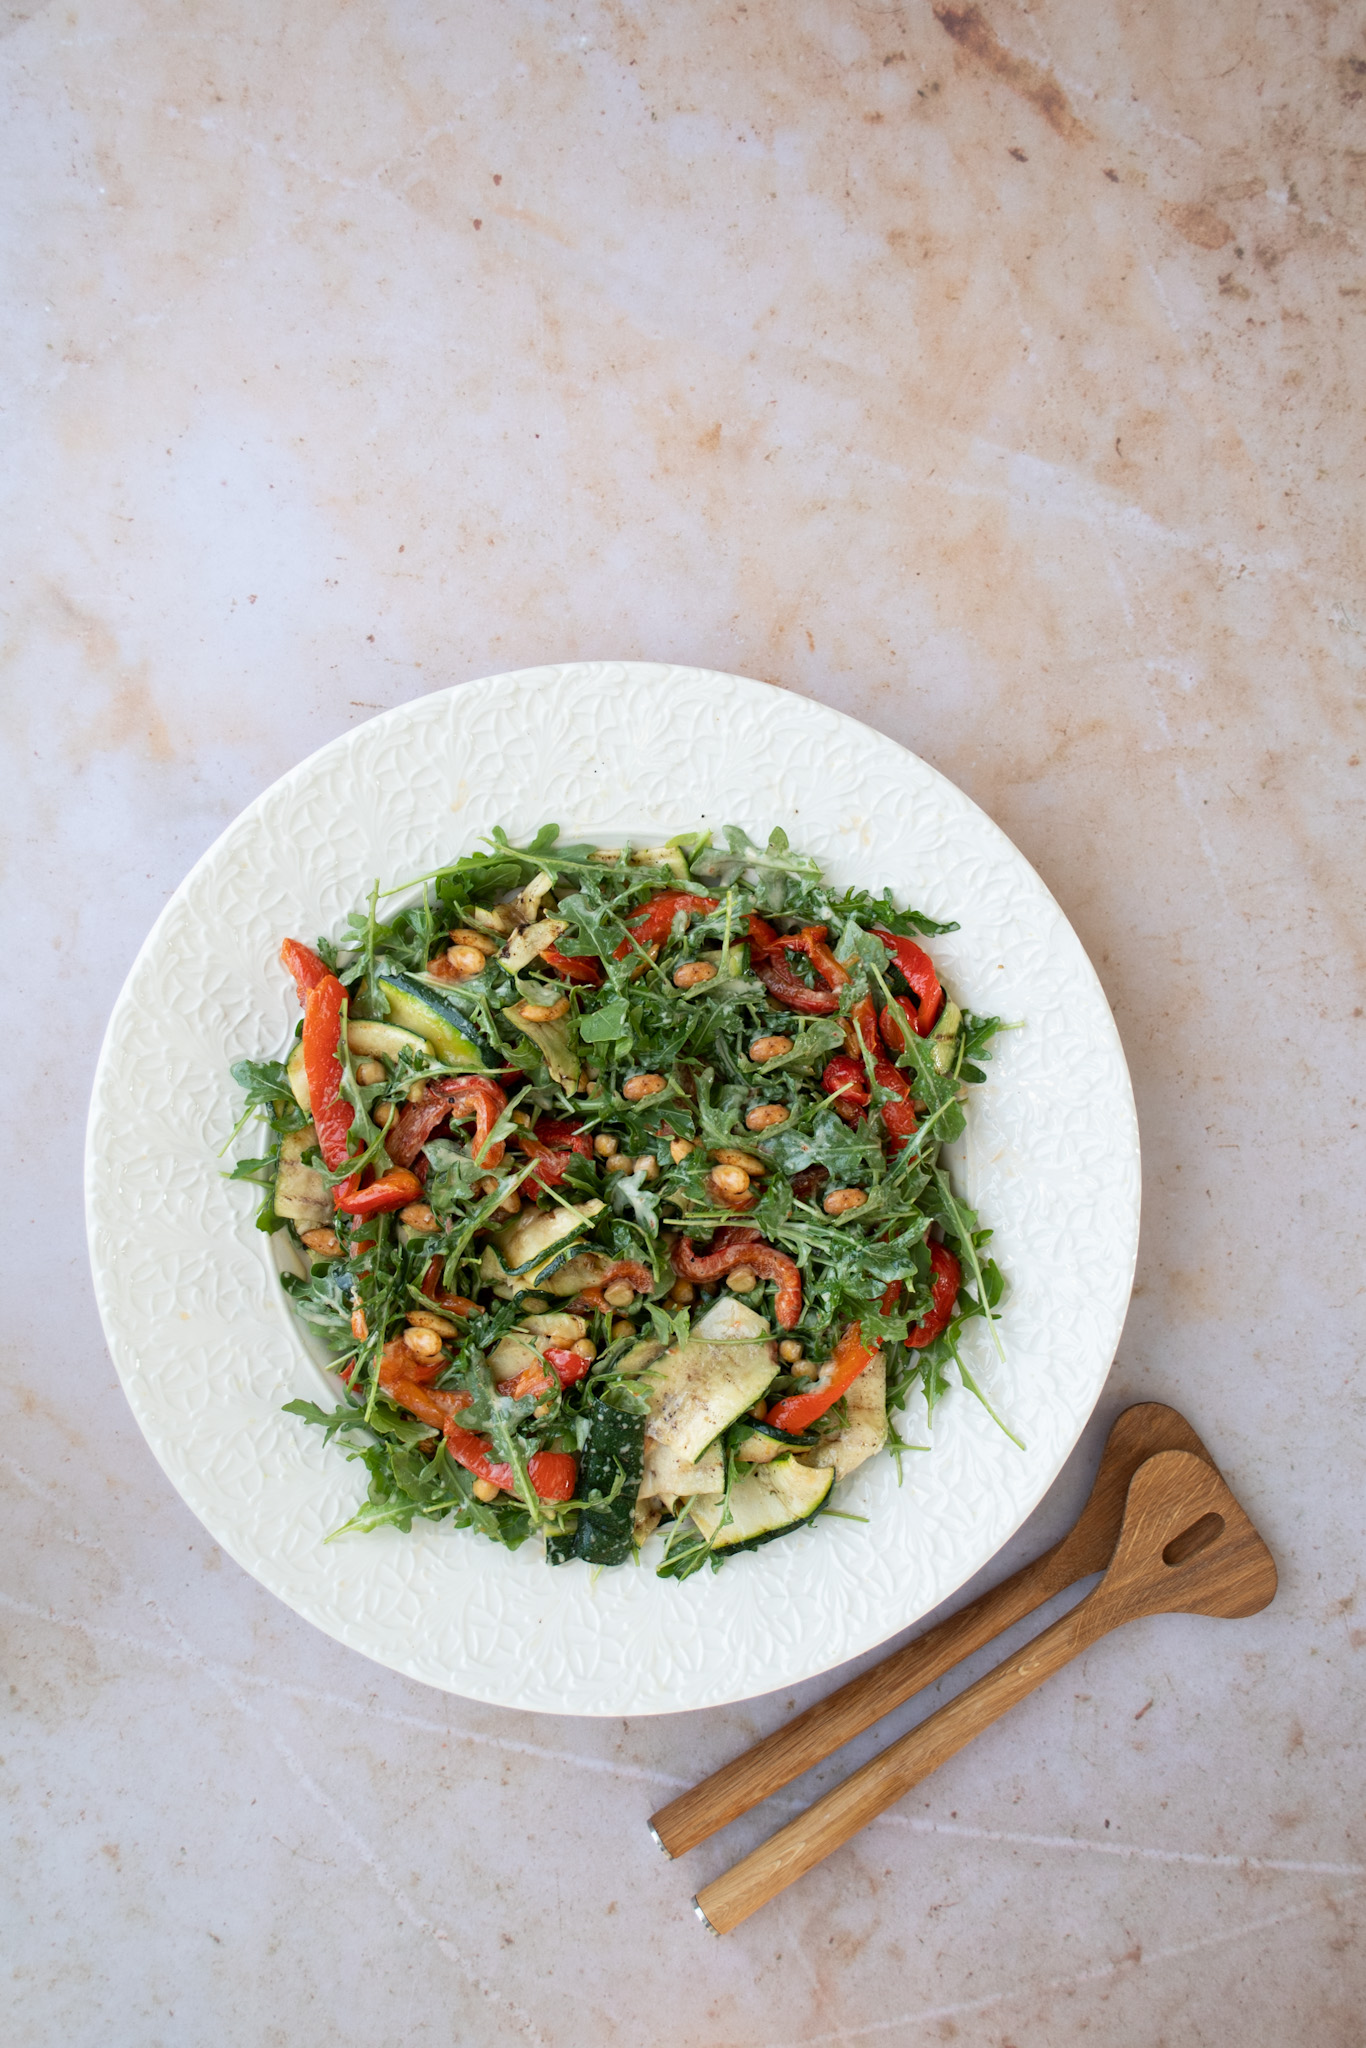 Roasted Vegetable & Rocket Salad with Pimenton Roasted Almonds